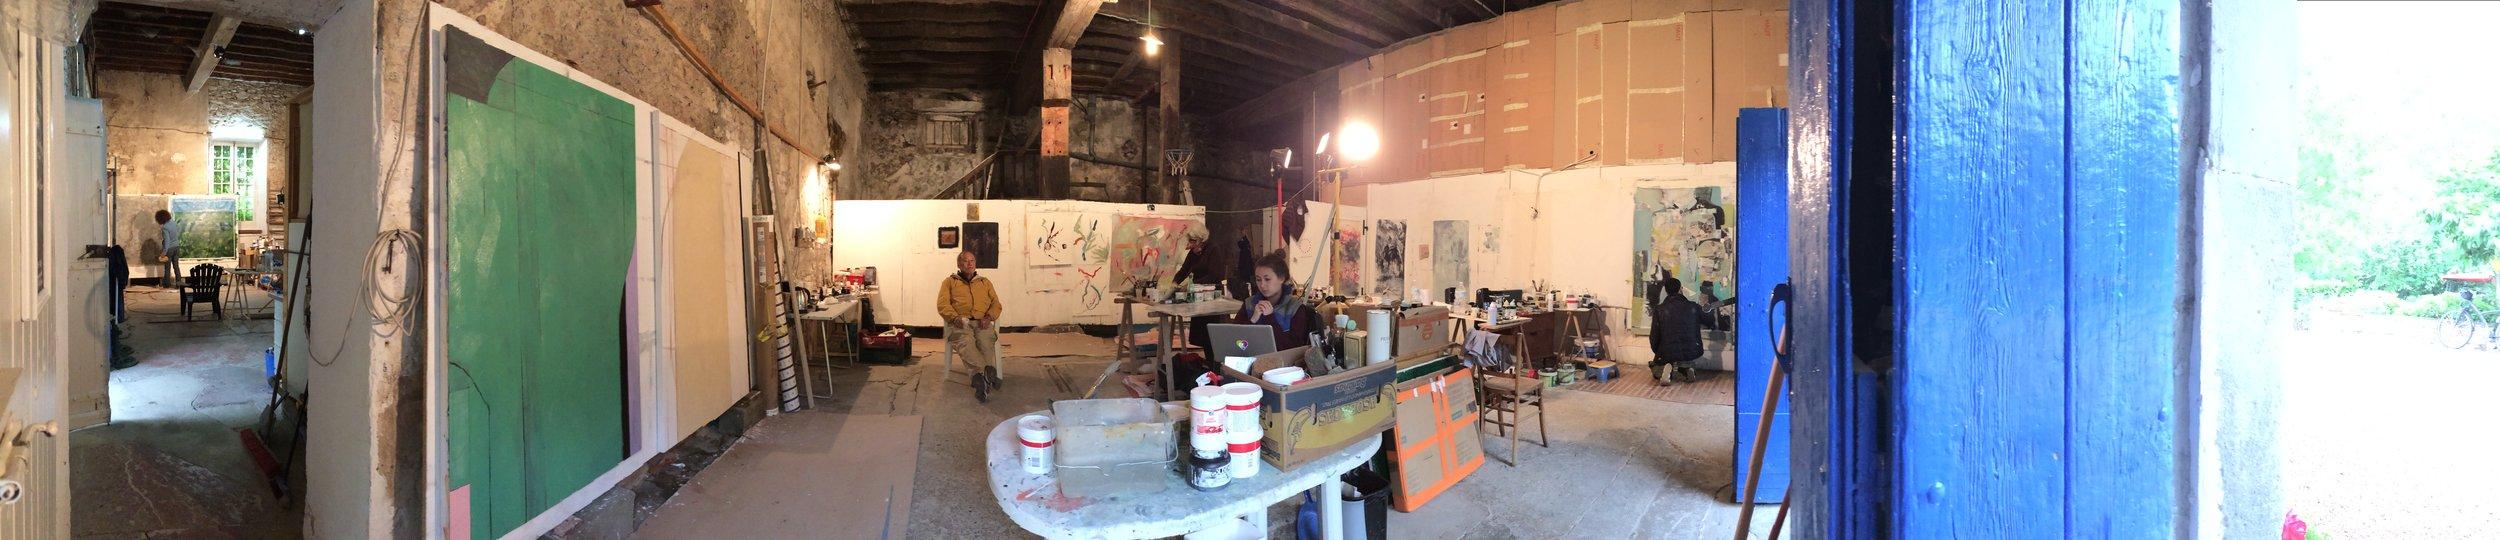 IMG_0915 Studio 360 copy.JPG